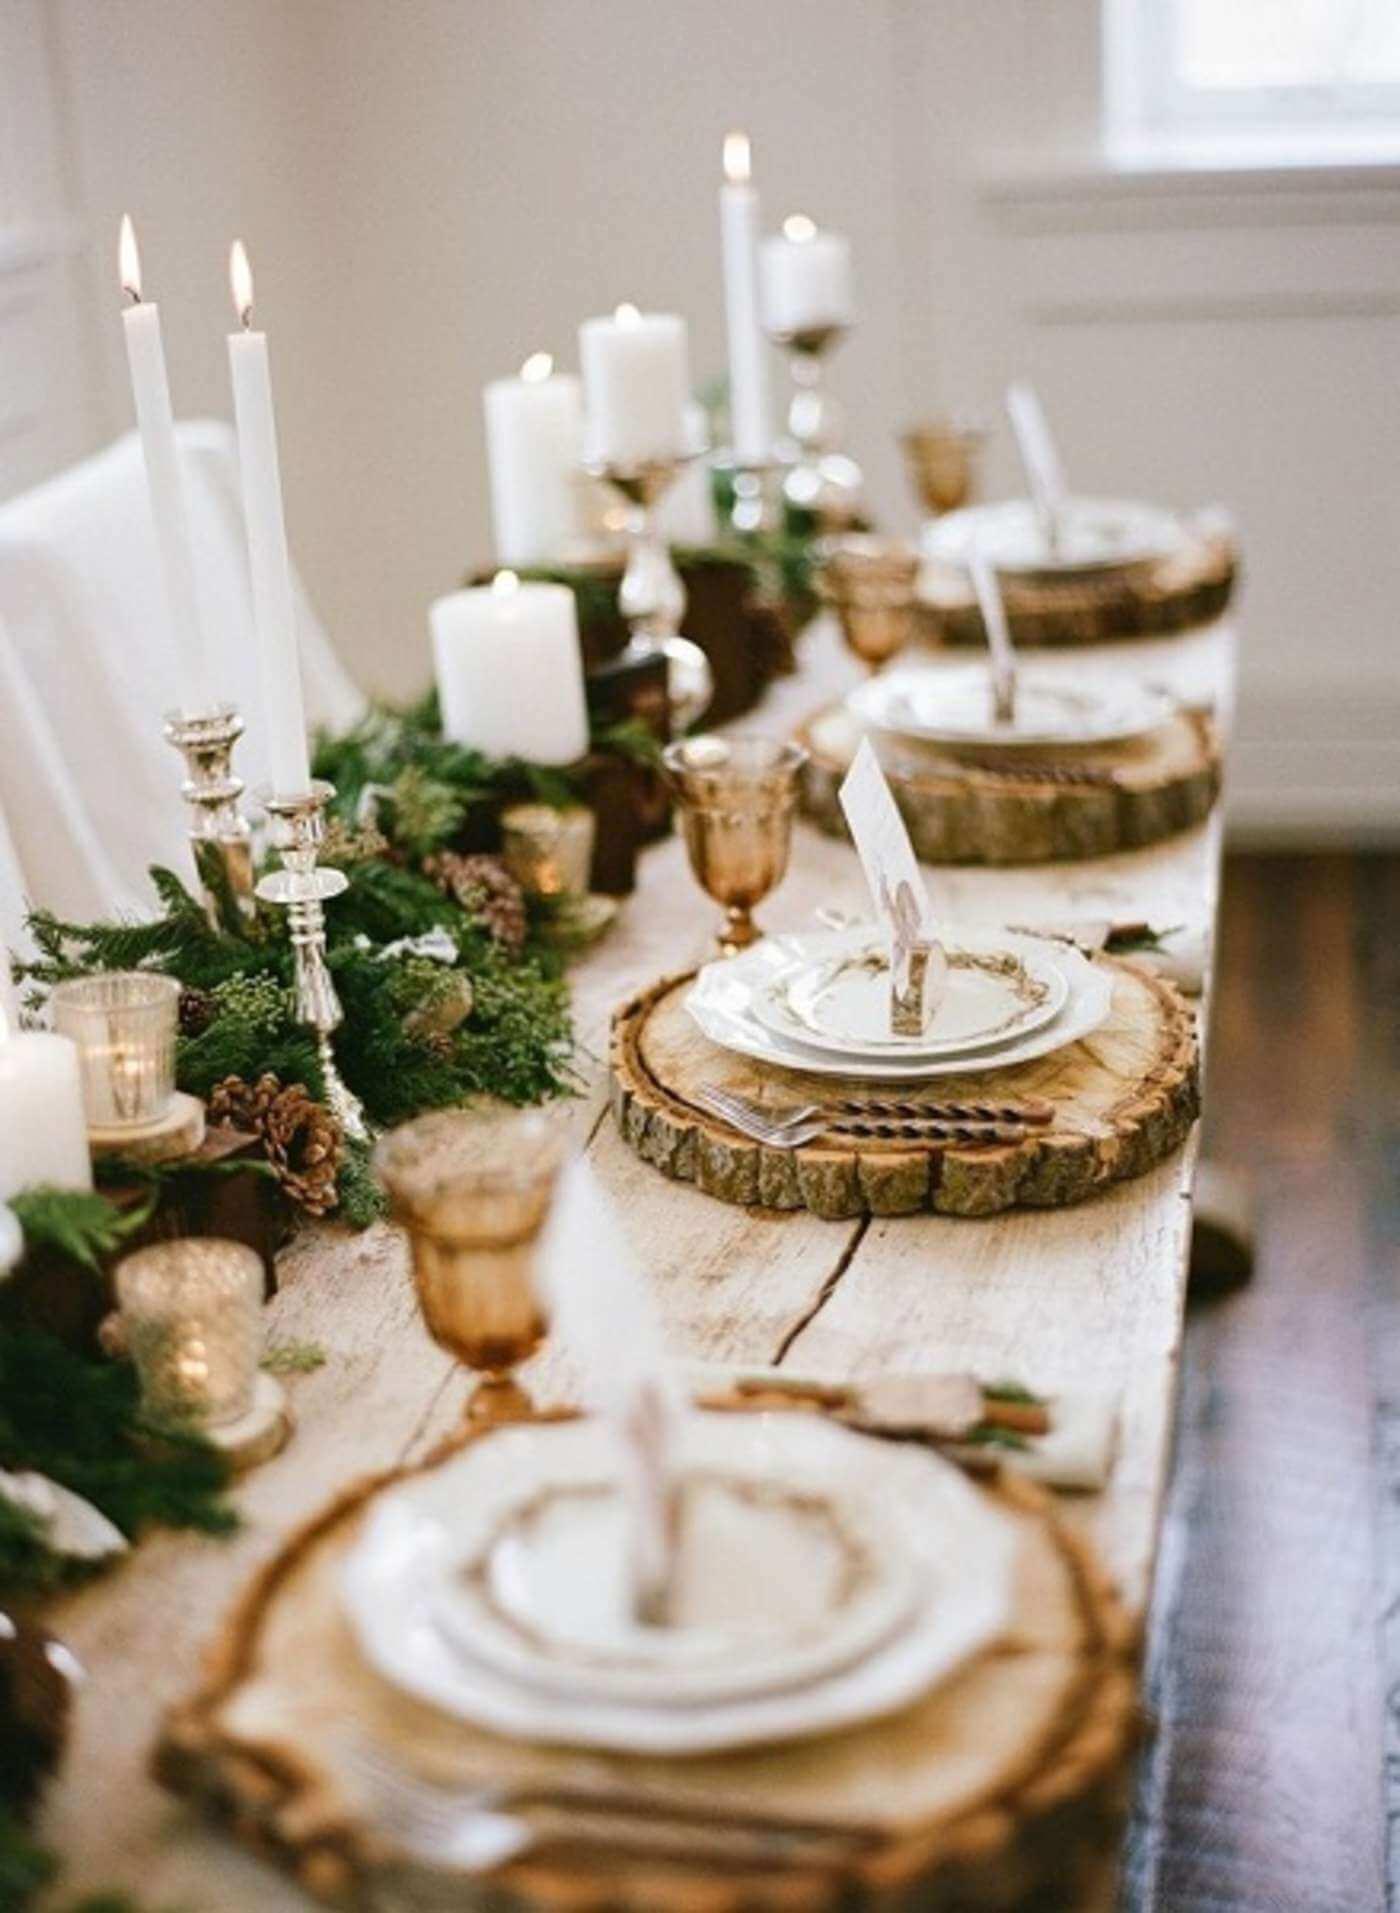 Woodland Elegance Meandering Table Centerpiece